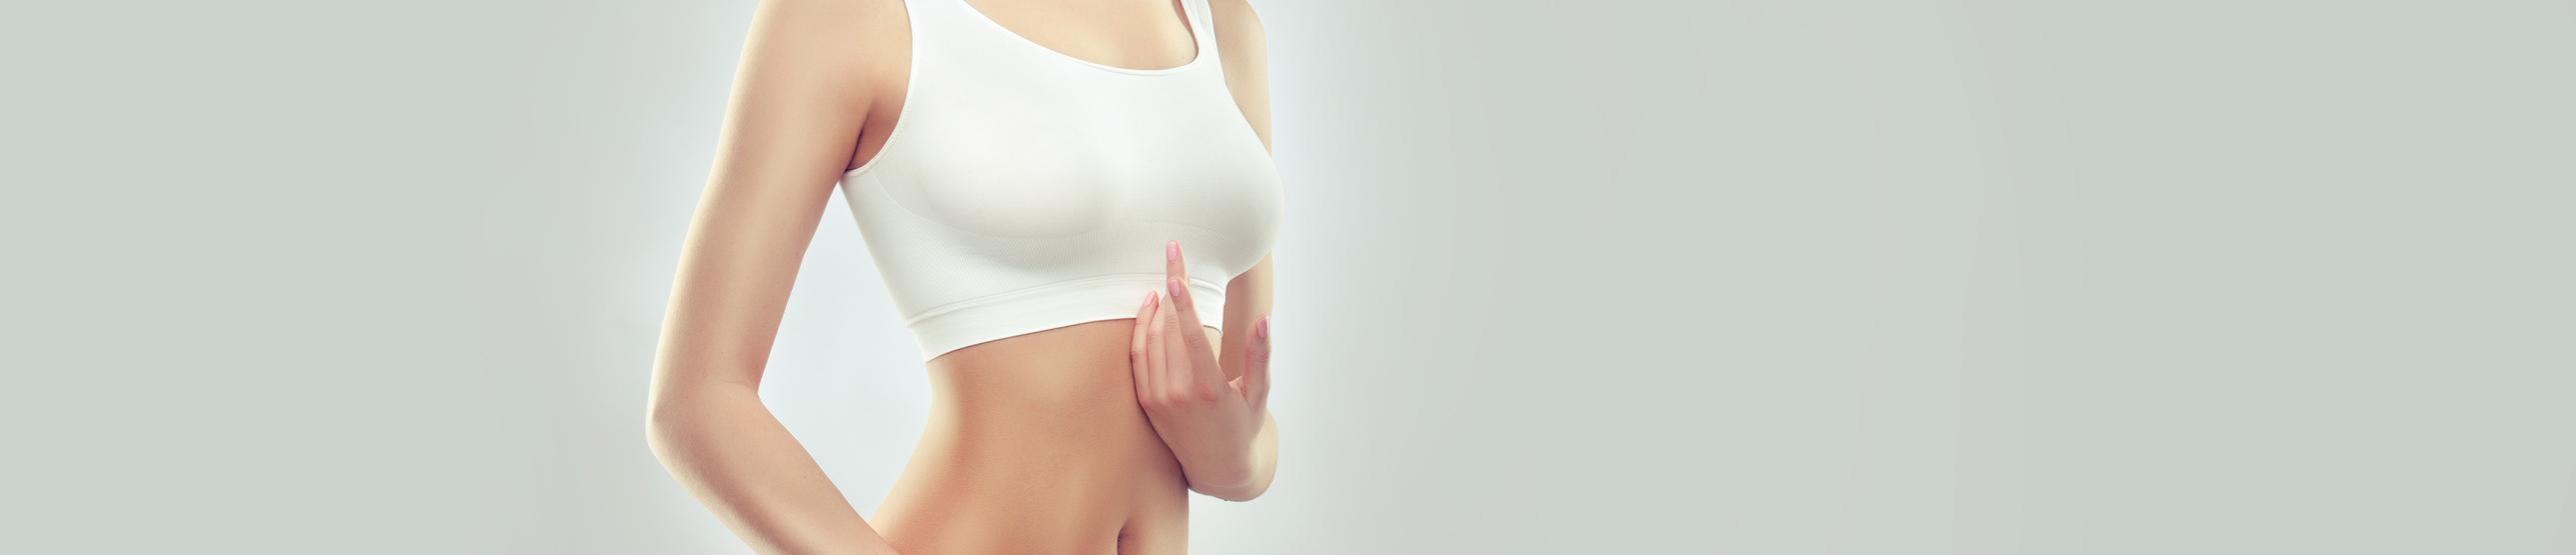 Brustvergroesserung_mitI